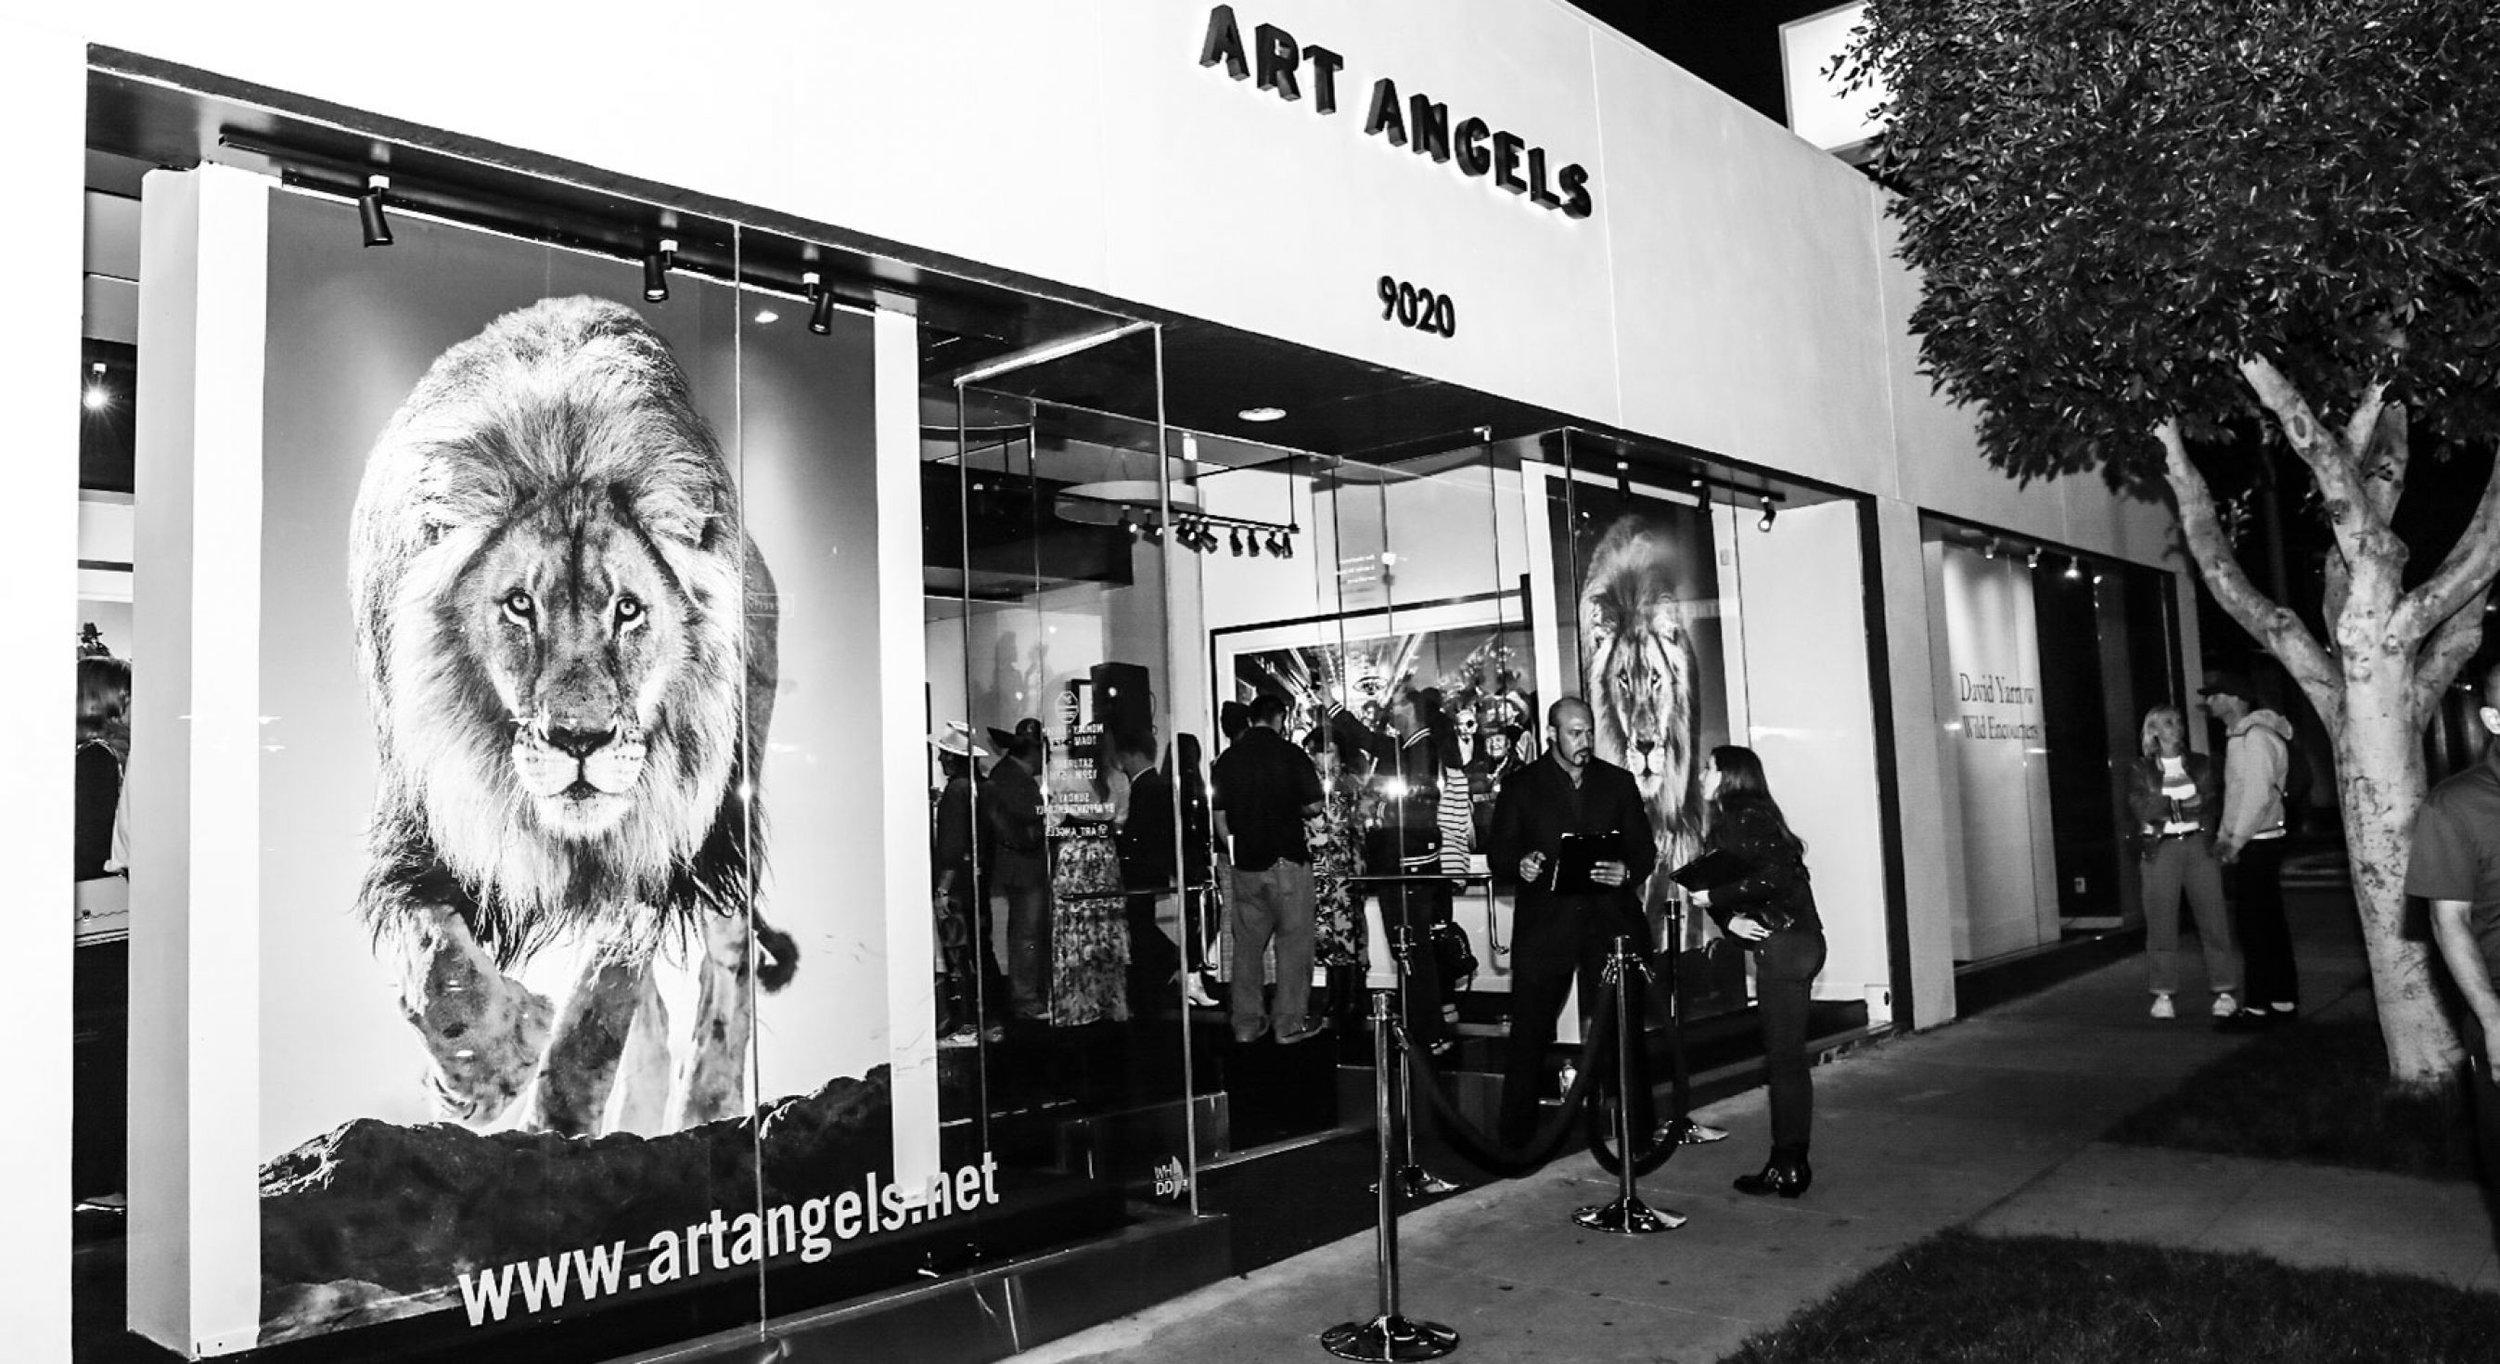 ArtAngels2-0x1470-c-default.jpg